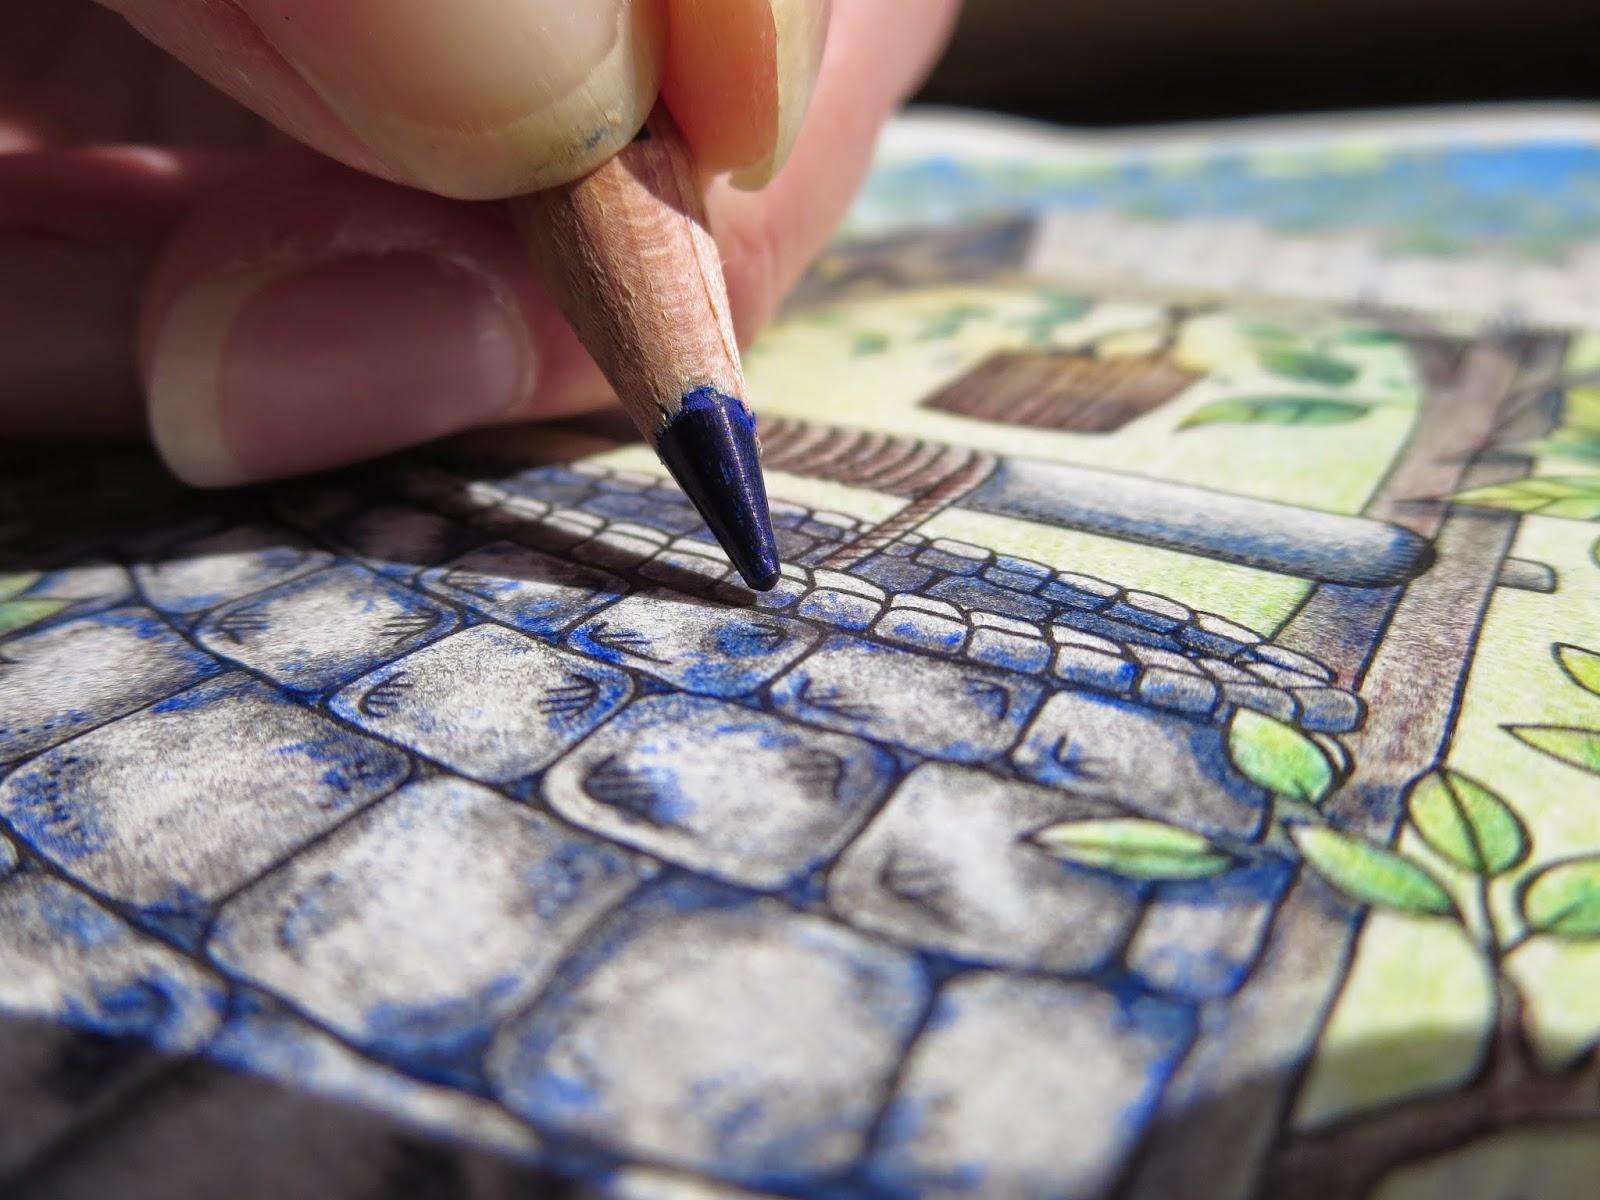 The secret garden coloring book review - My Secret Garden Colouring Book The Well Part 2